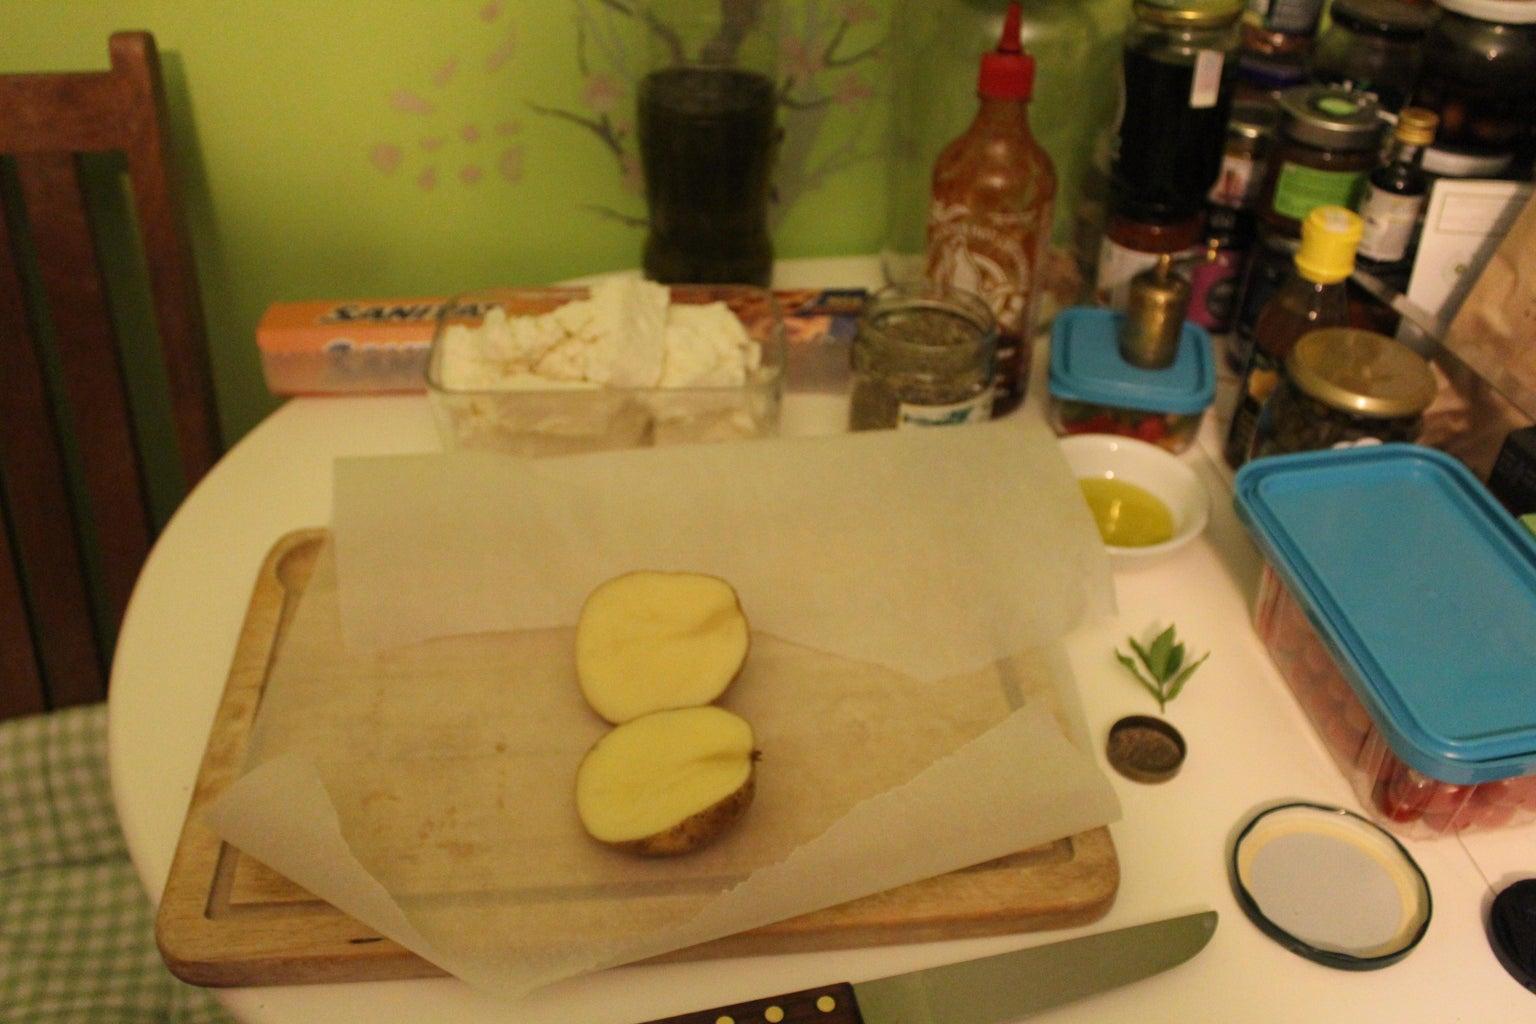 Cut Potato in Half